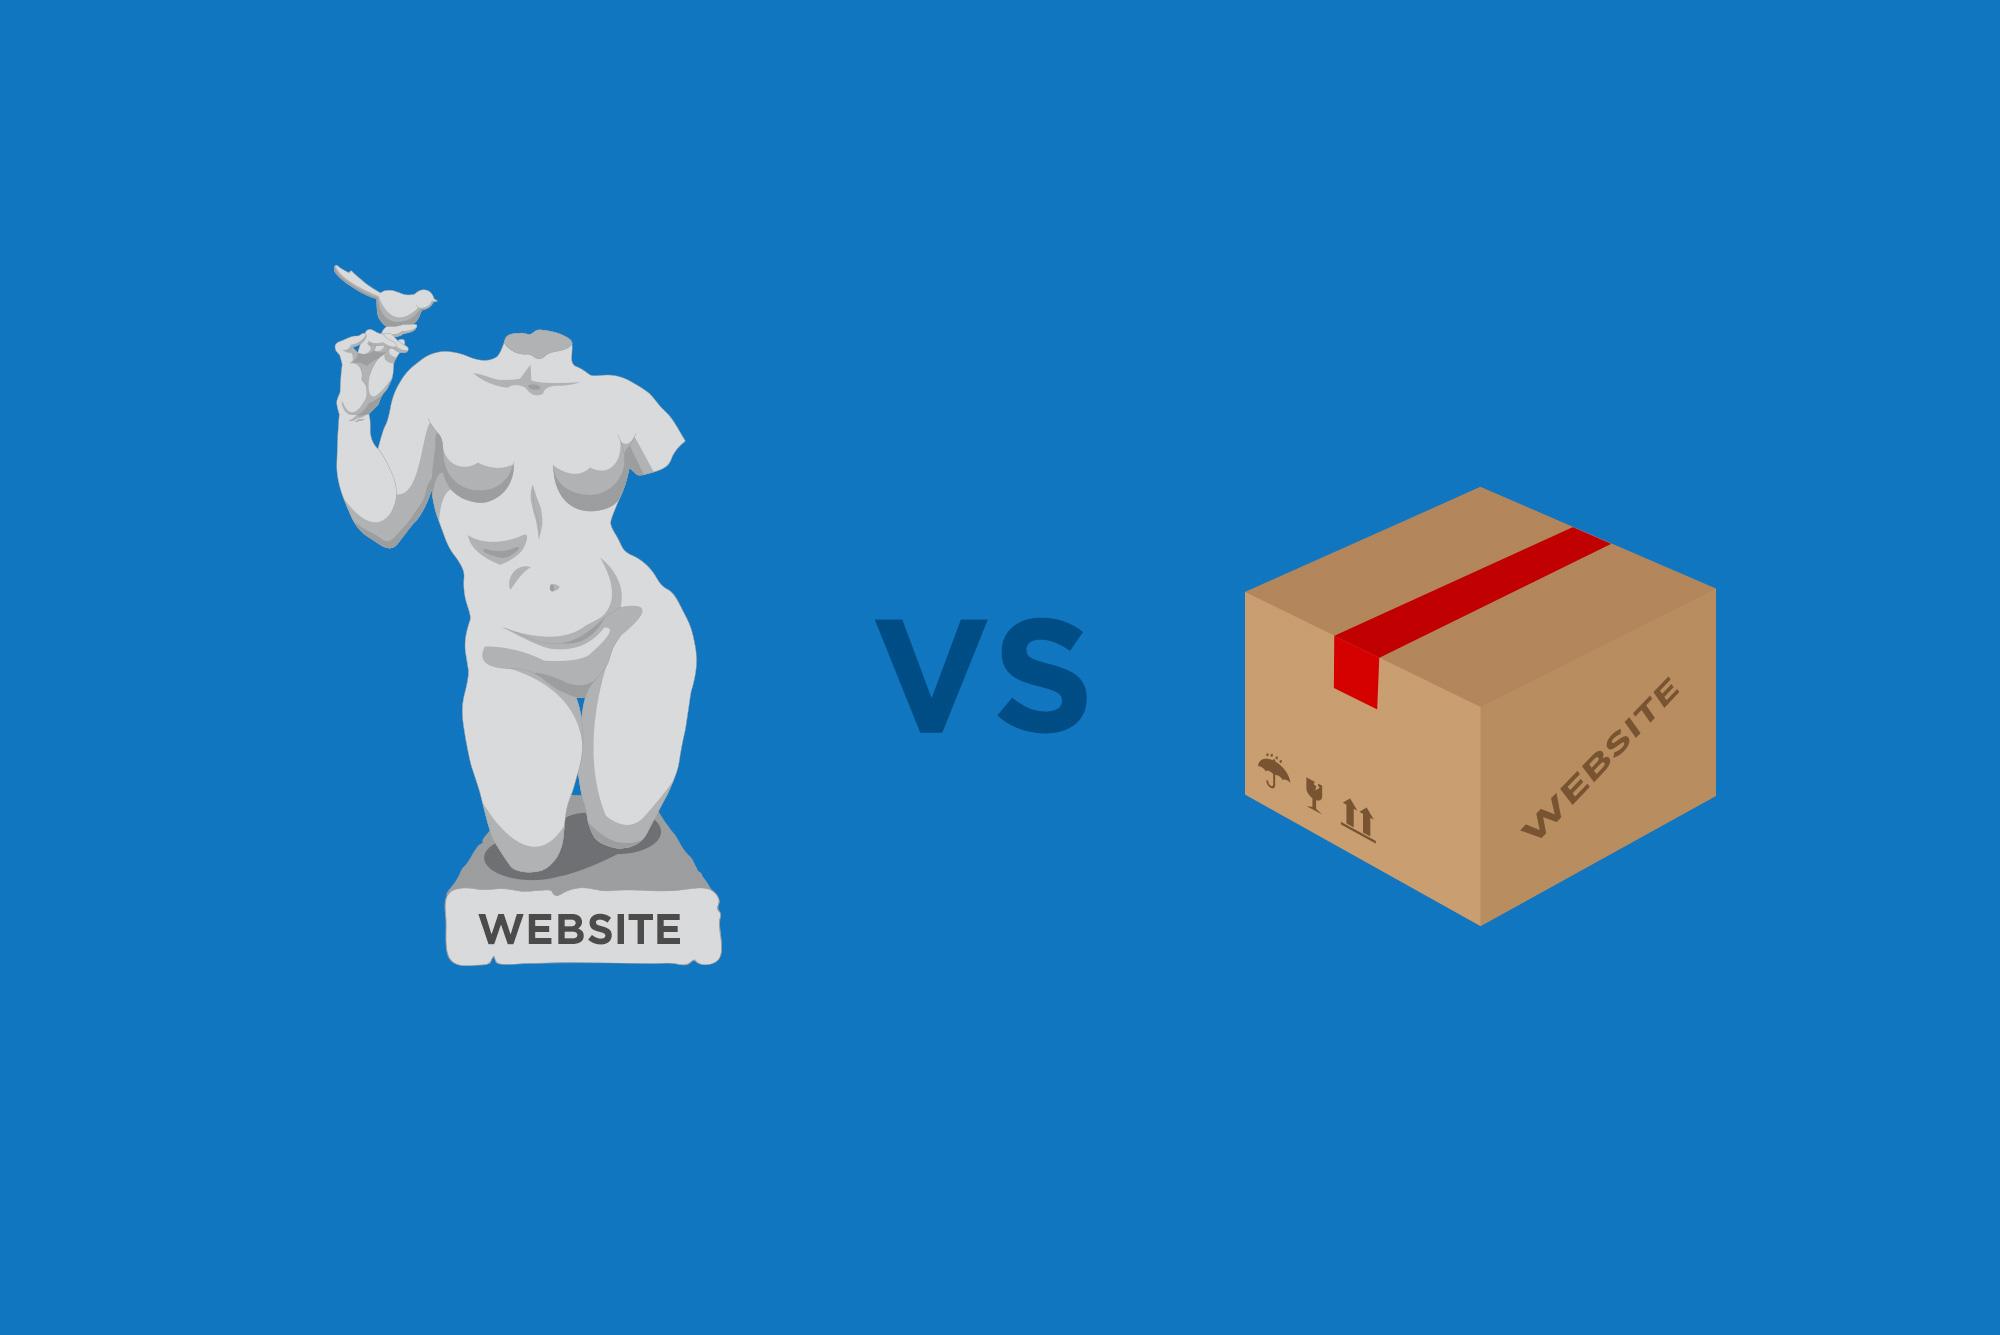 Website statue vs website box - custom vs templates